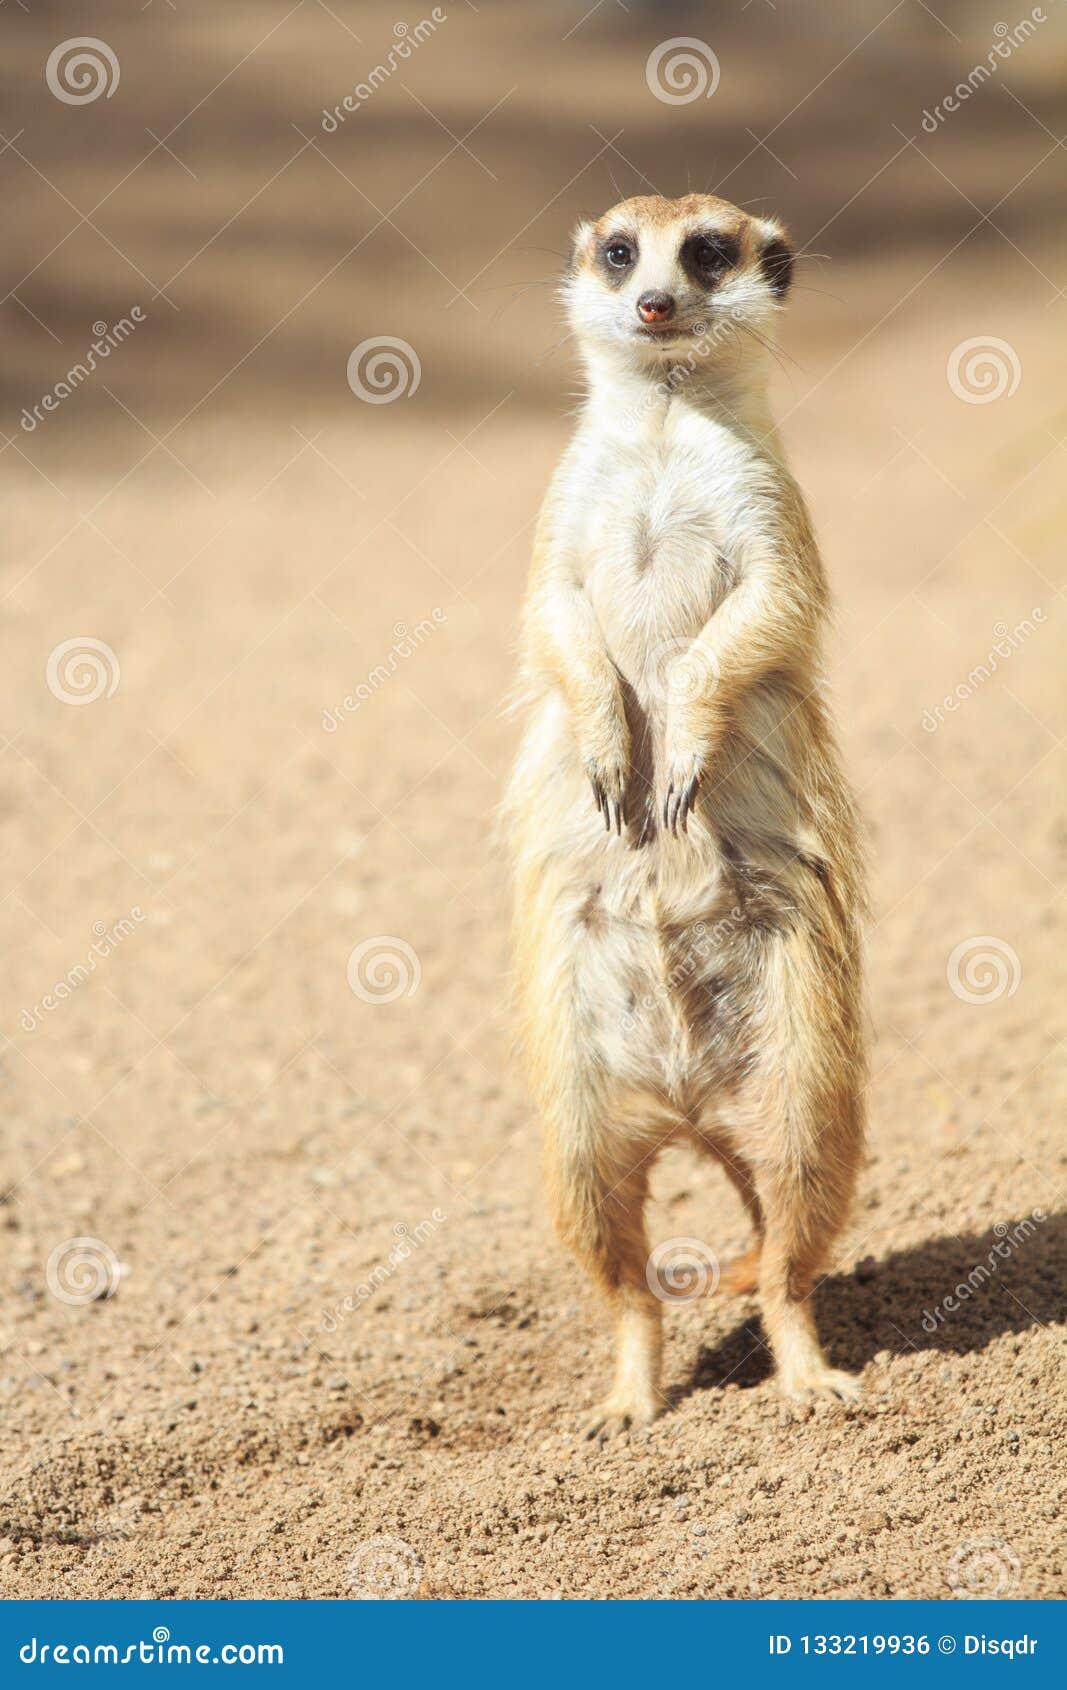 Portrait of Meerkat Suricata suricatta, African native animal, small carnivore